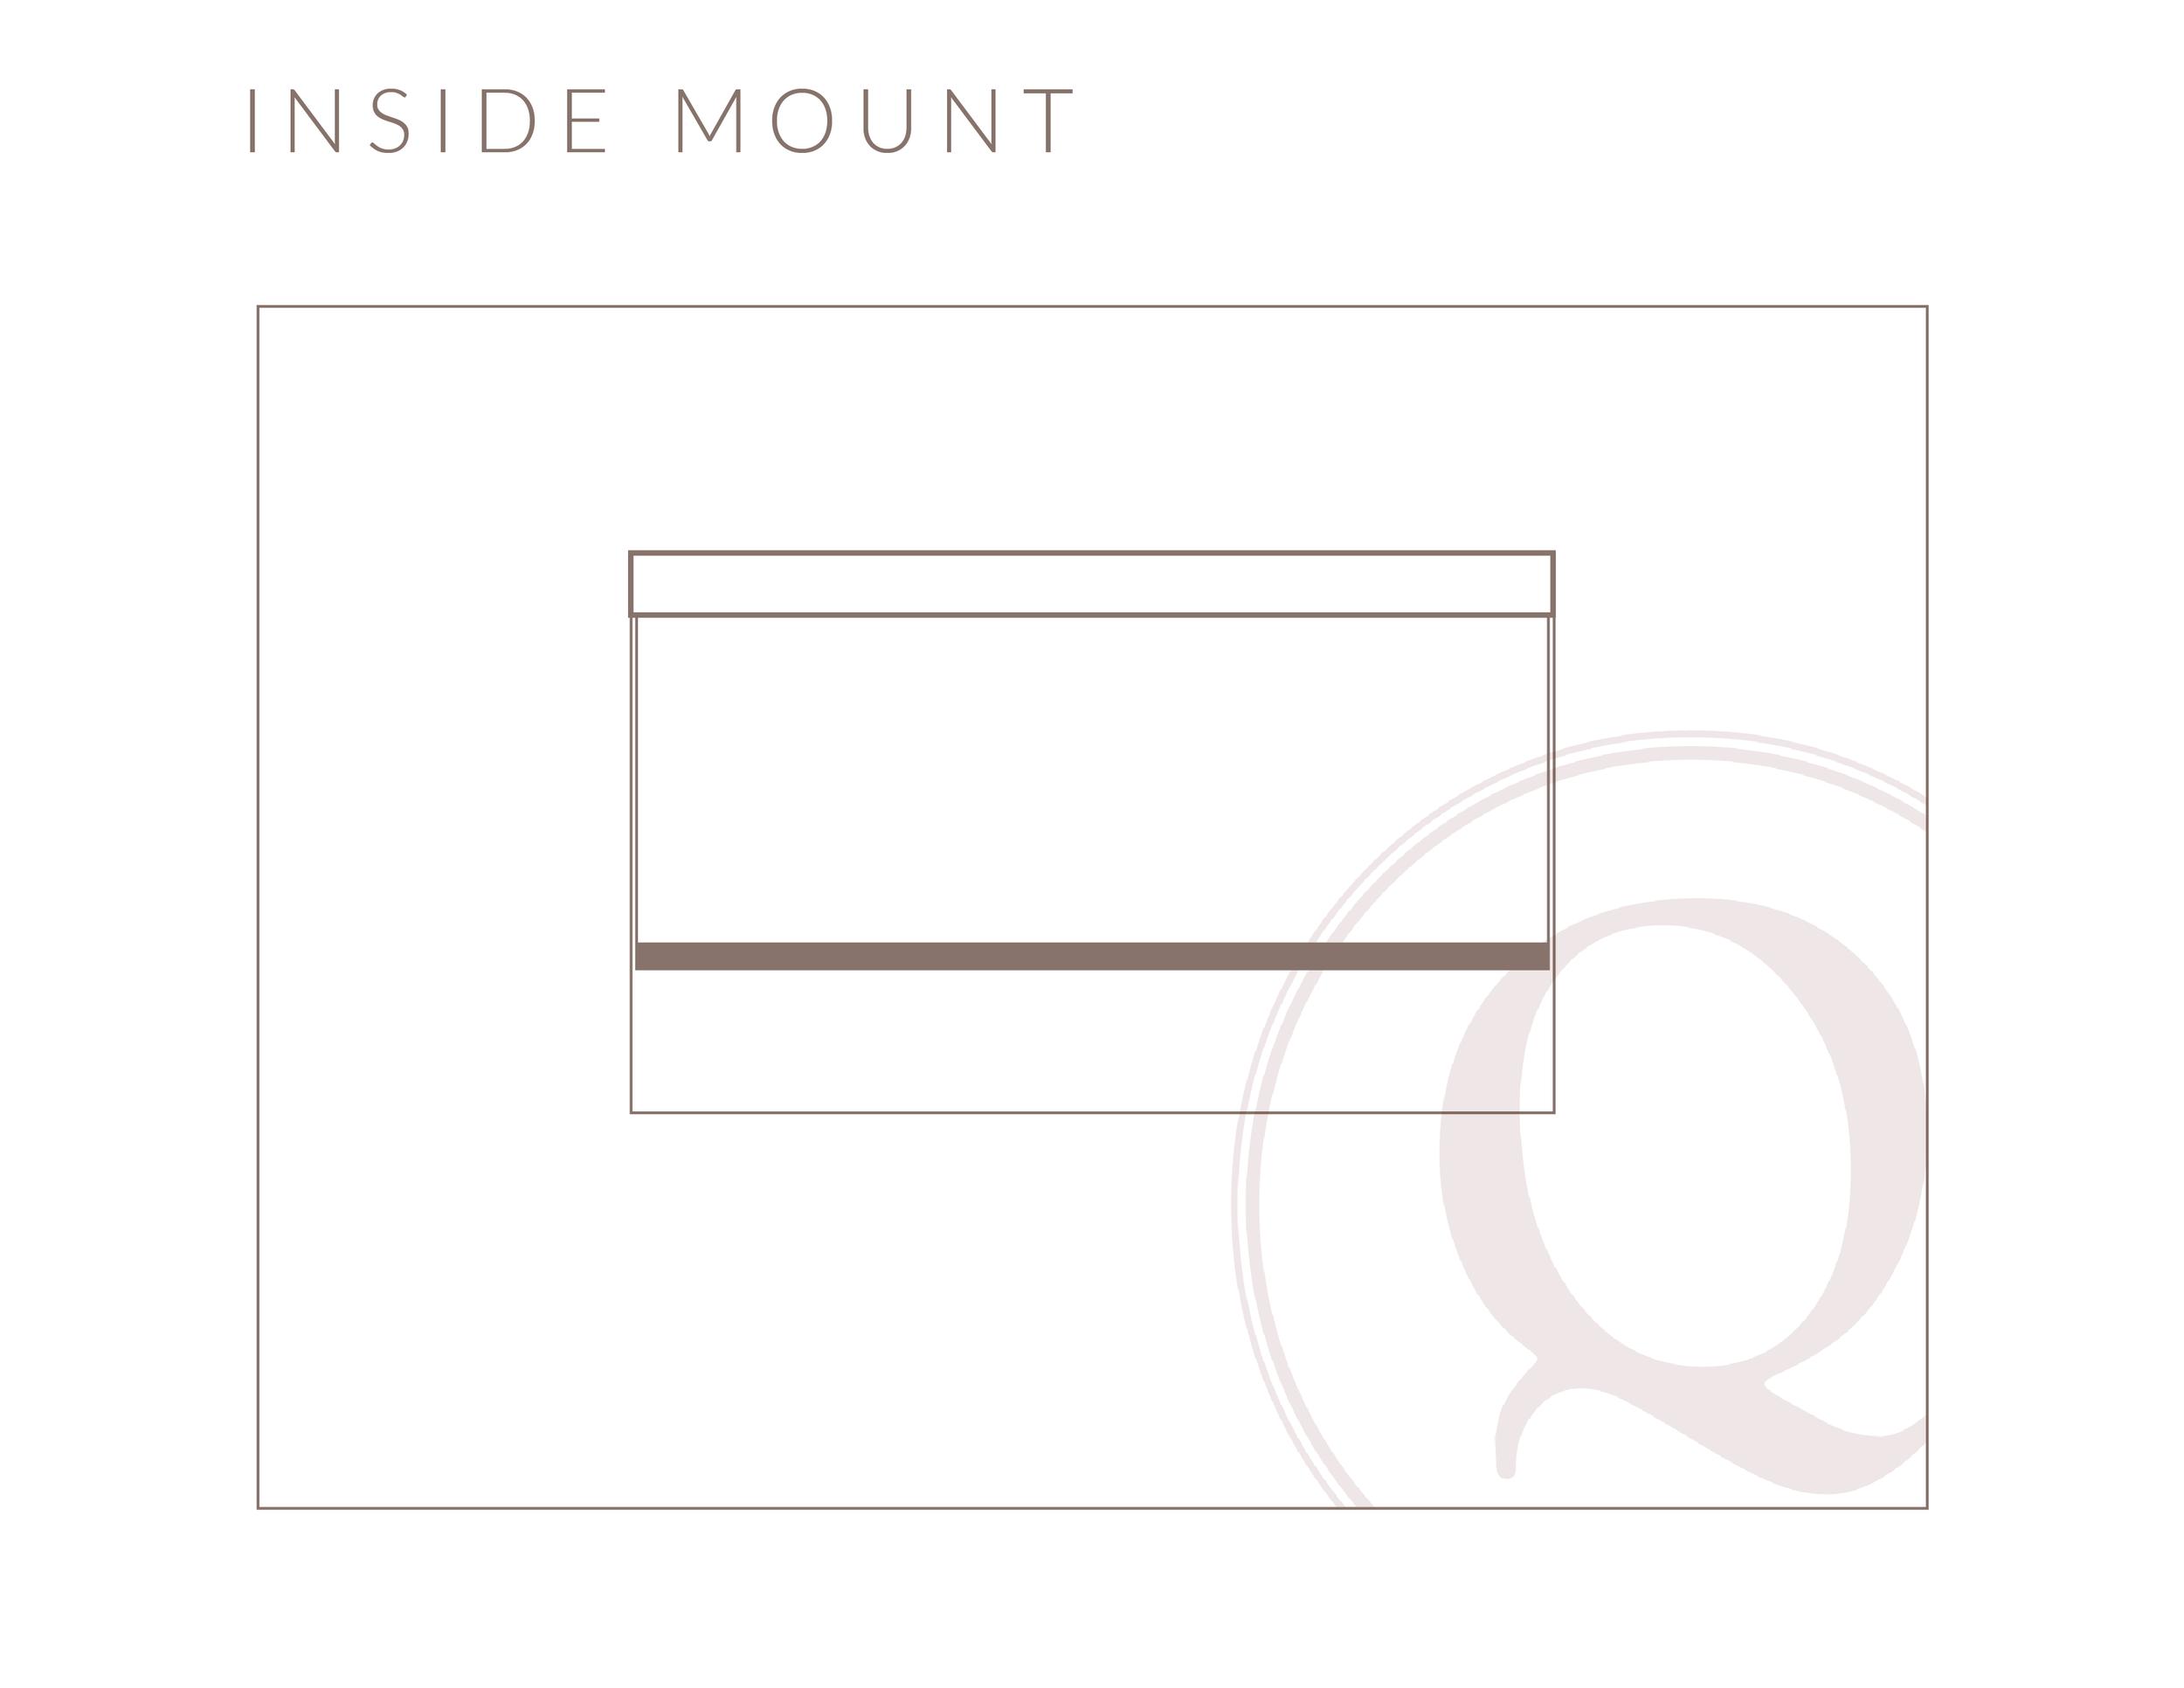 Inside Mount Roller Shade